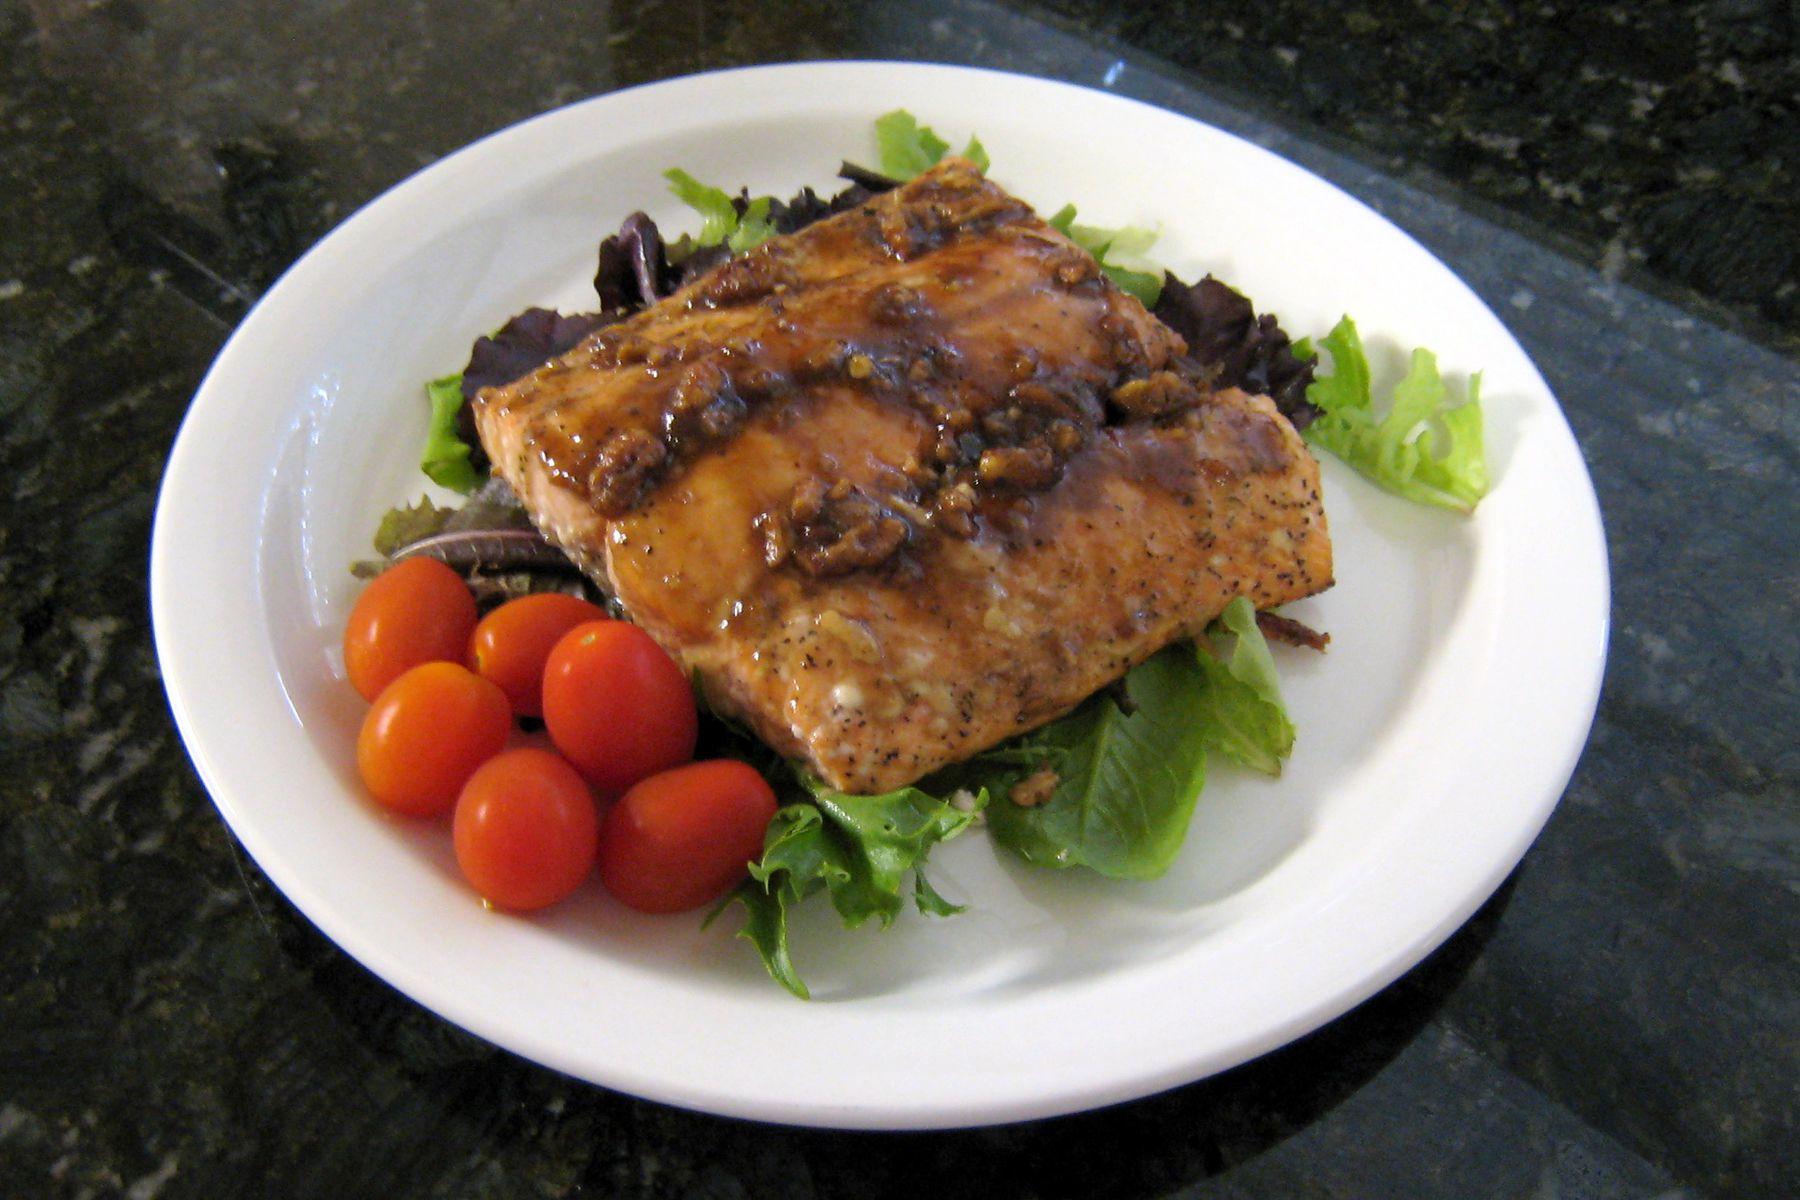 Kosher lemon garlic baked salmon fillet recipe salmon with brown sugar pecan glaze recipe ccuart Image collections